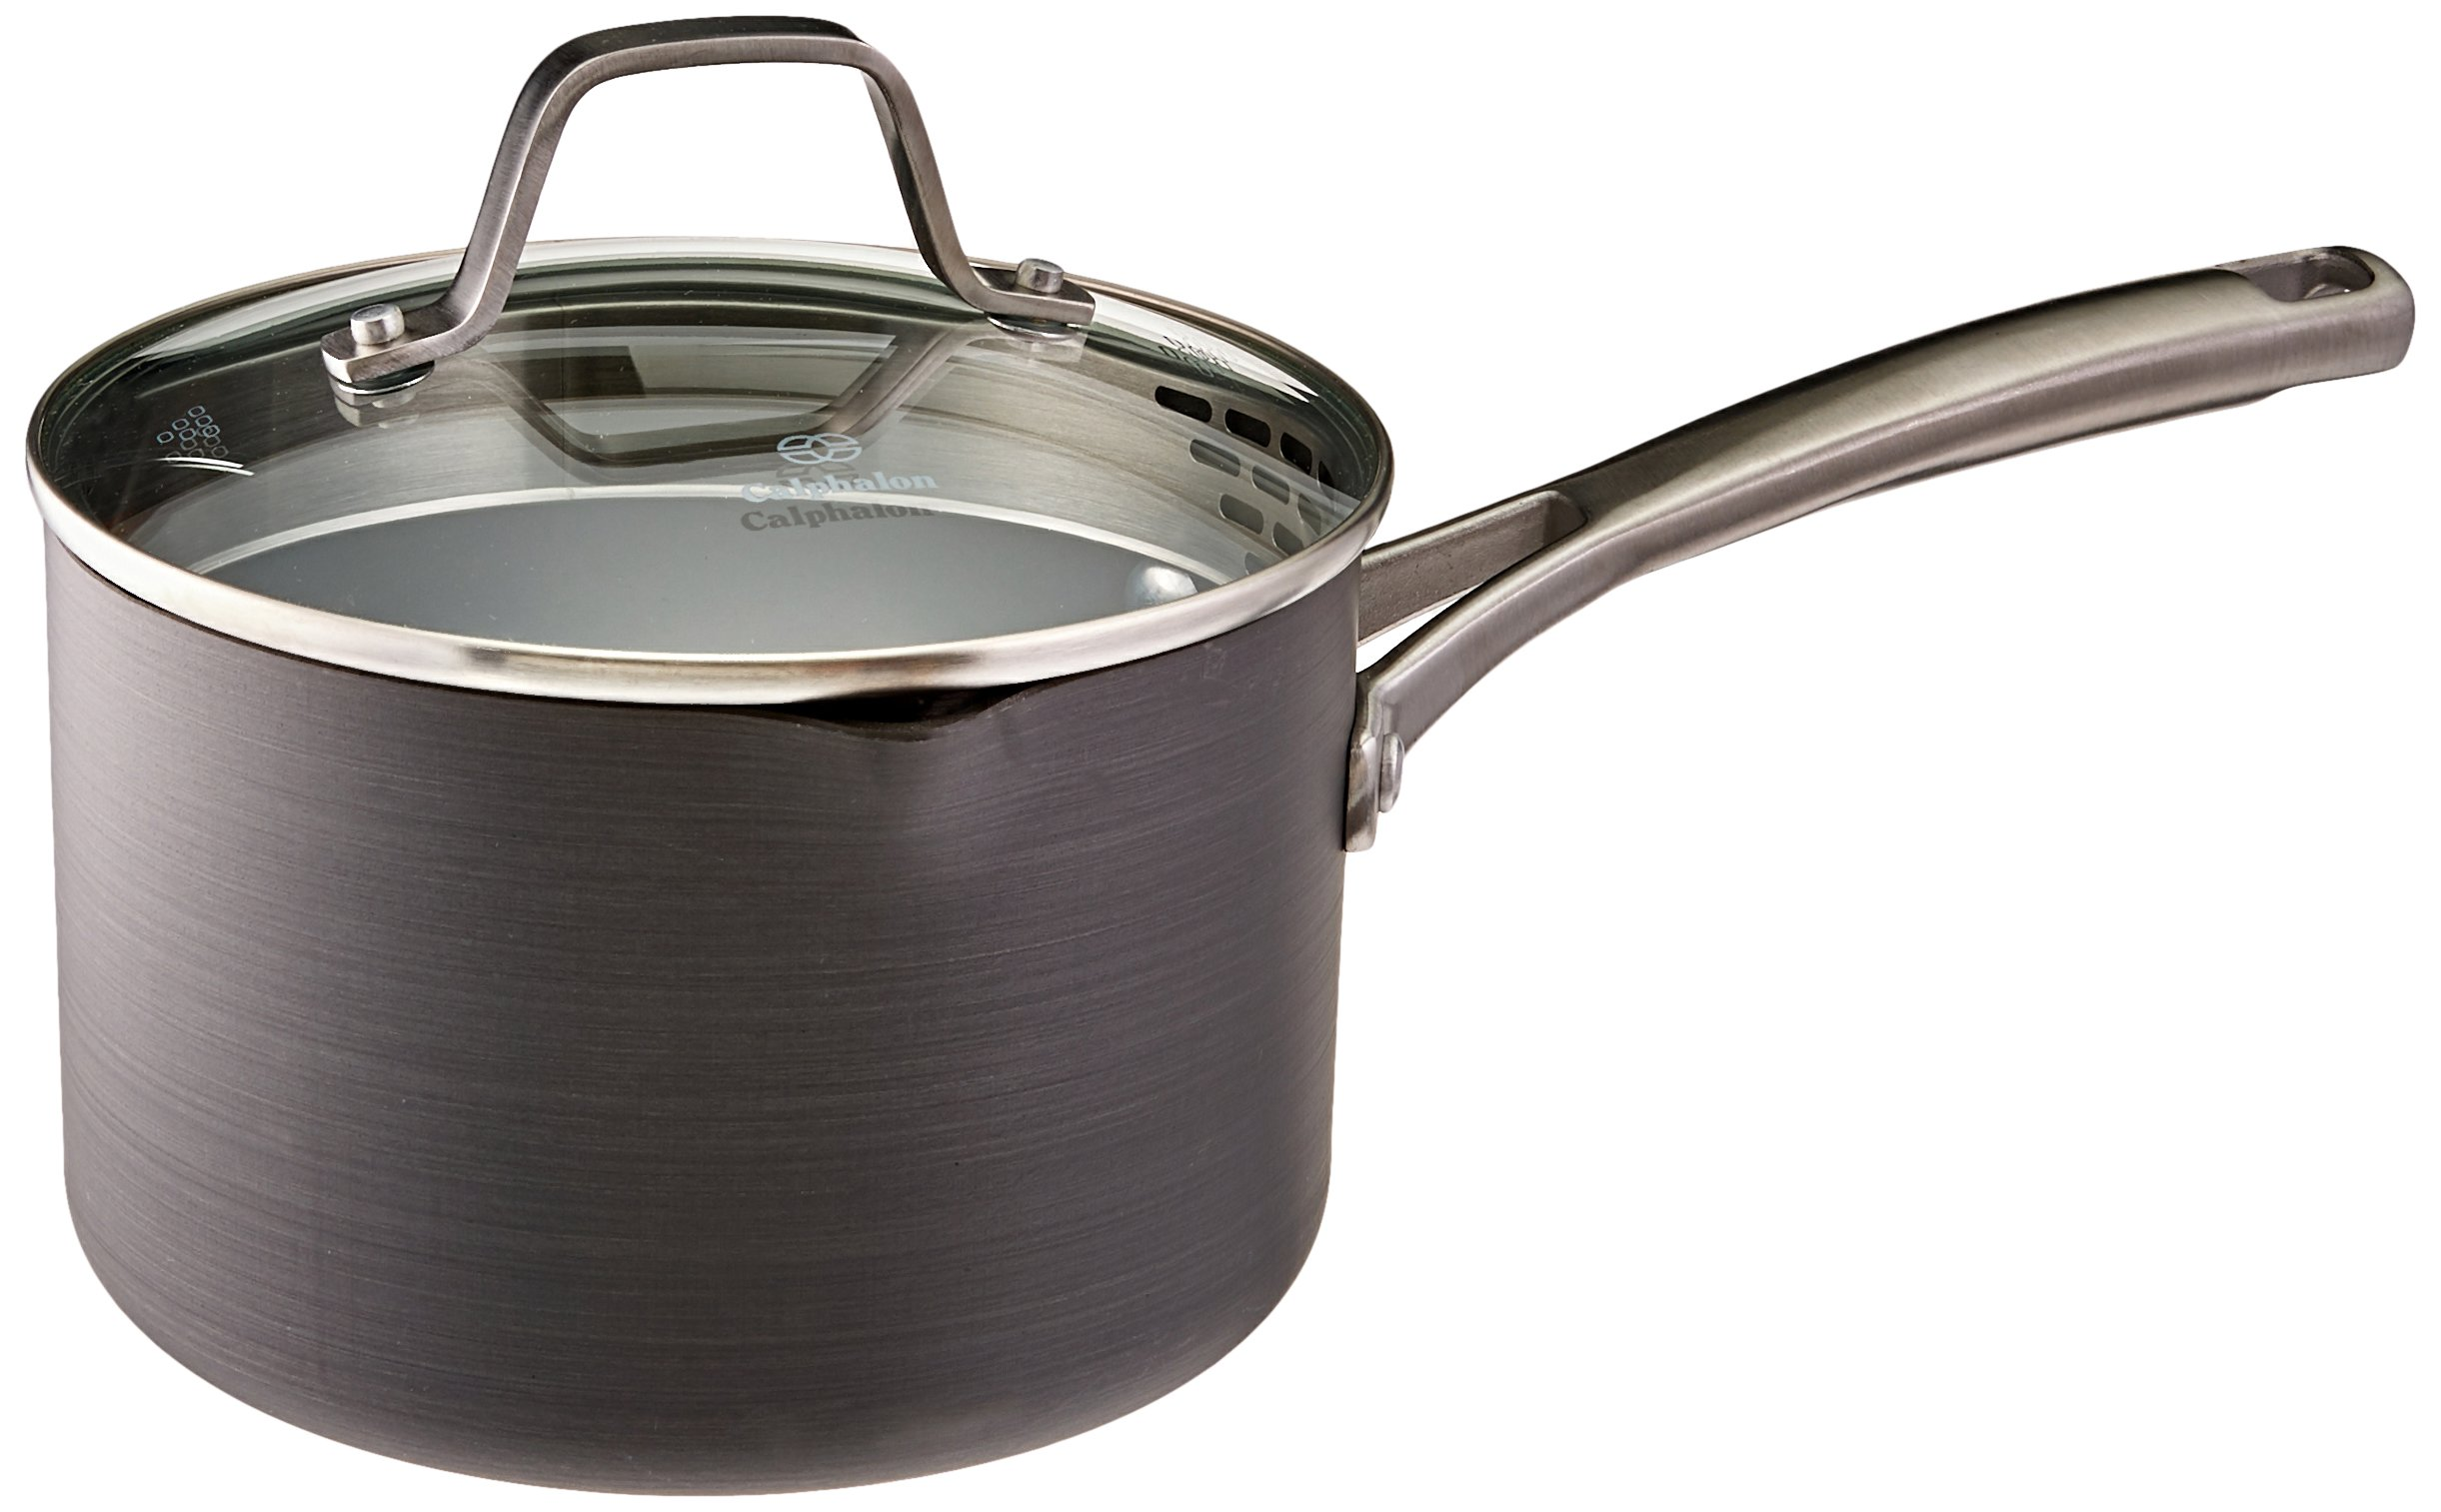 Calphalon Classic Nonstick Sauce Pan with Cover, 2.5 Quart, Grey by Calphalon (Image #1)